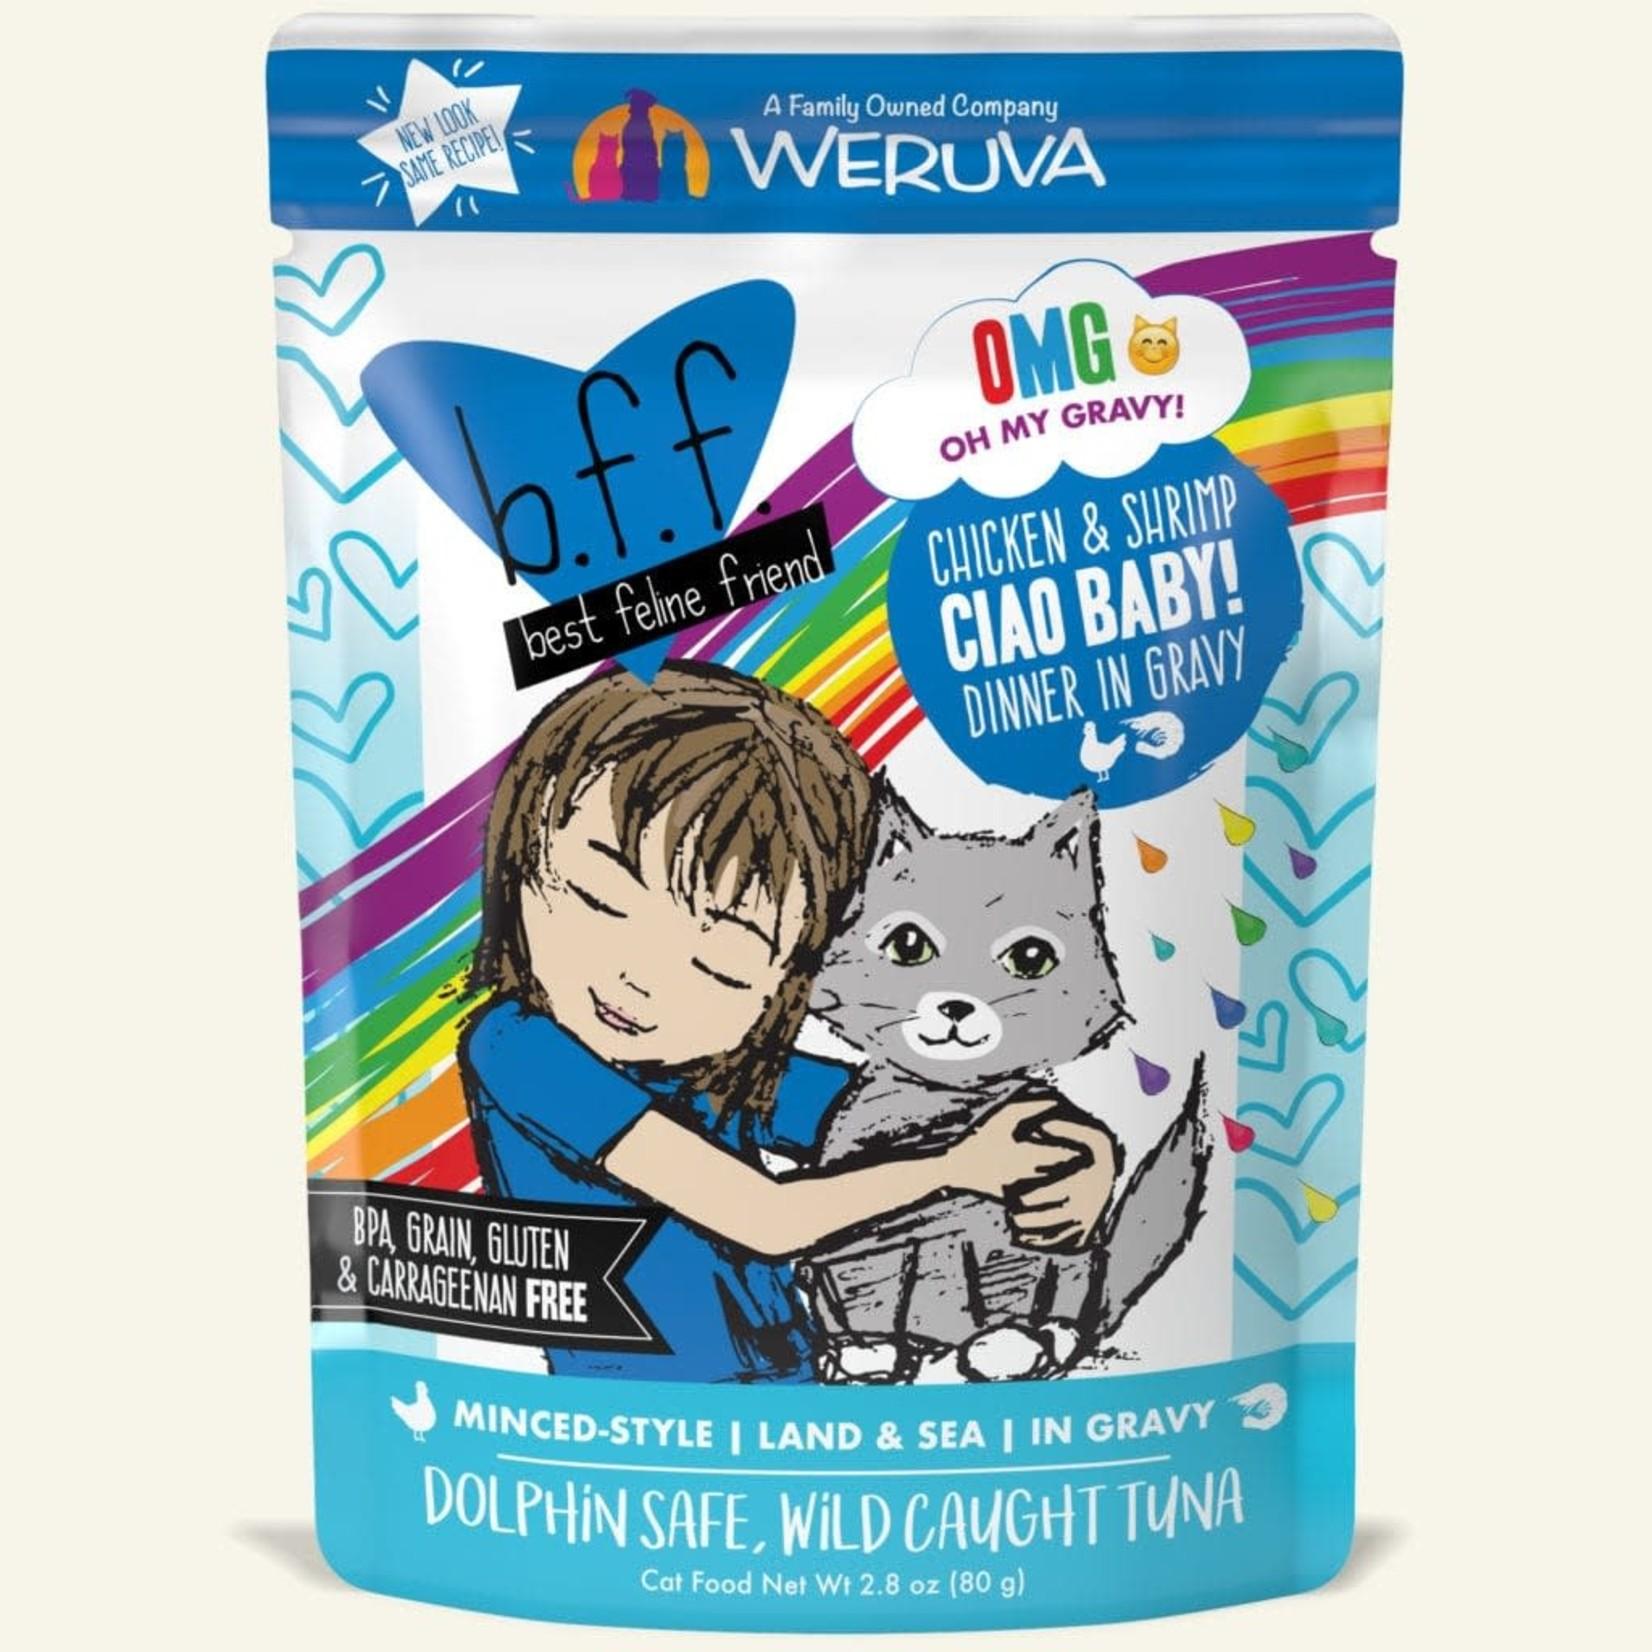 Weruva BFF OMG Cat Chicken & Shrimp Ciao Baby 2.8 OZ Pouch